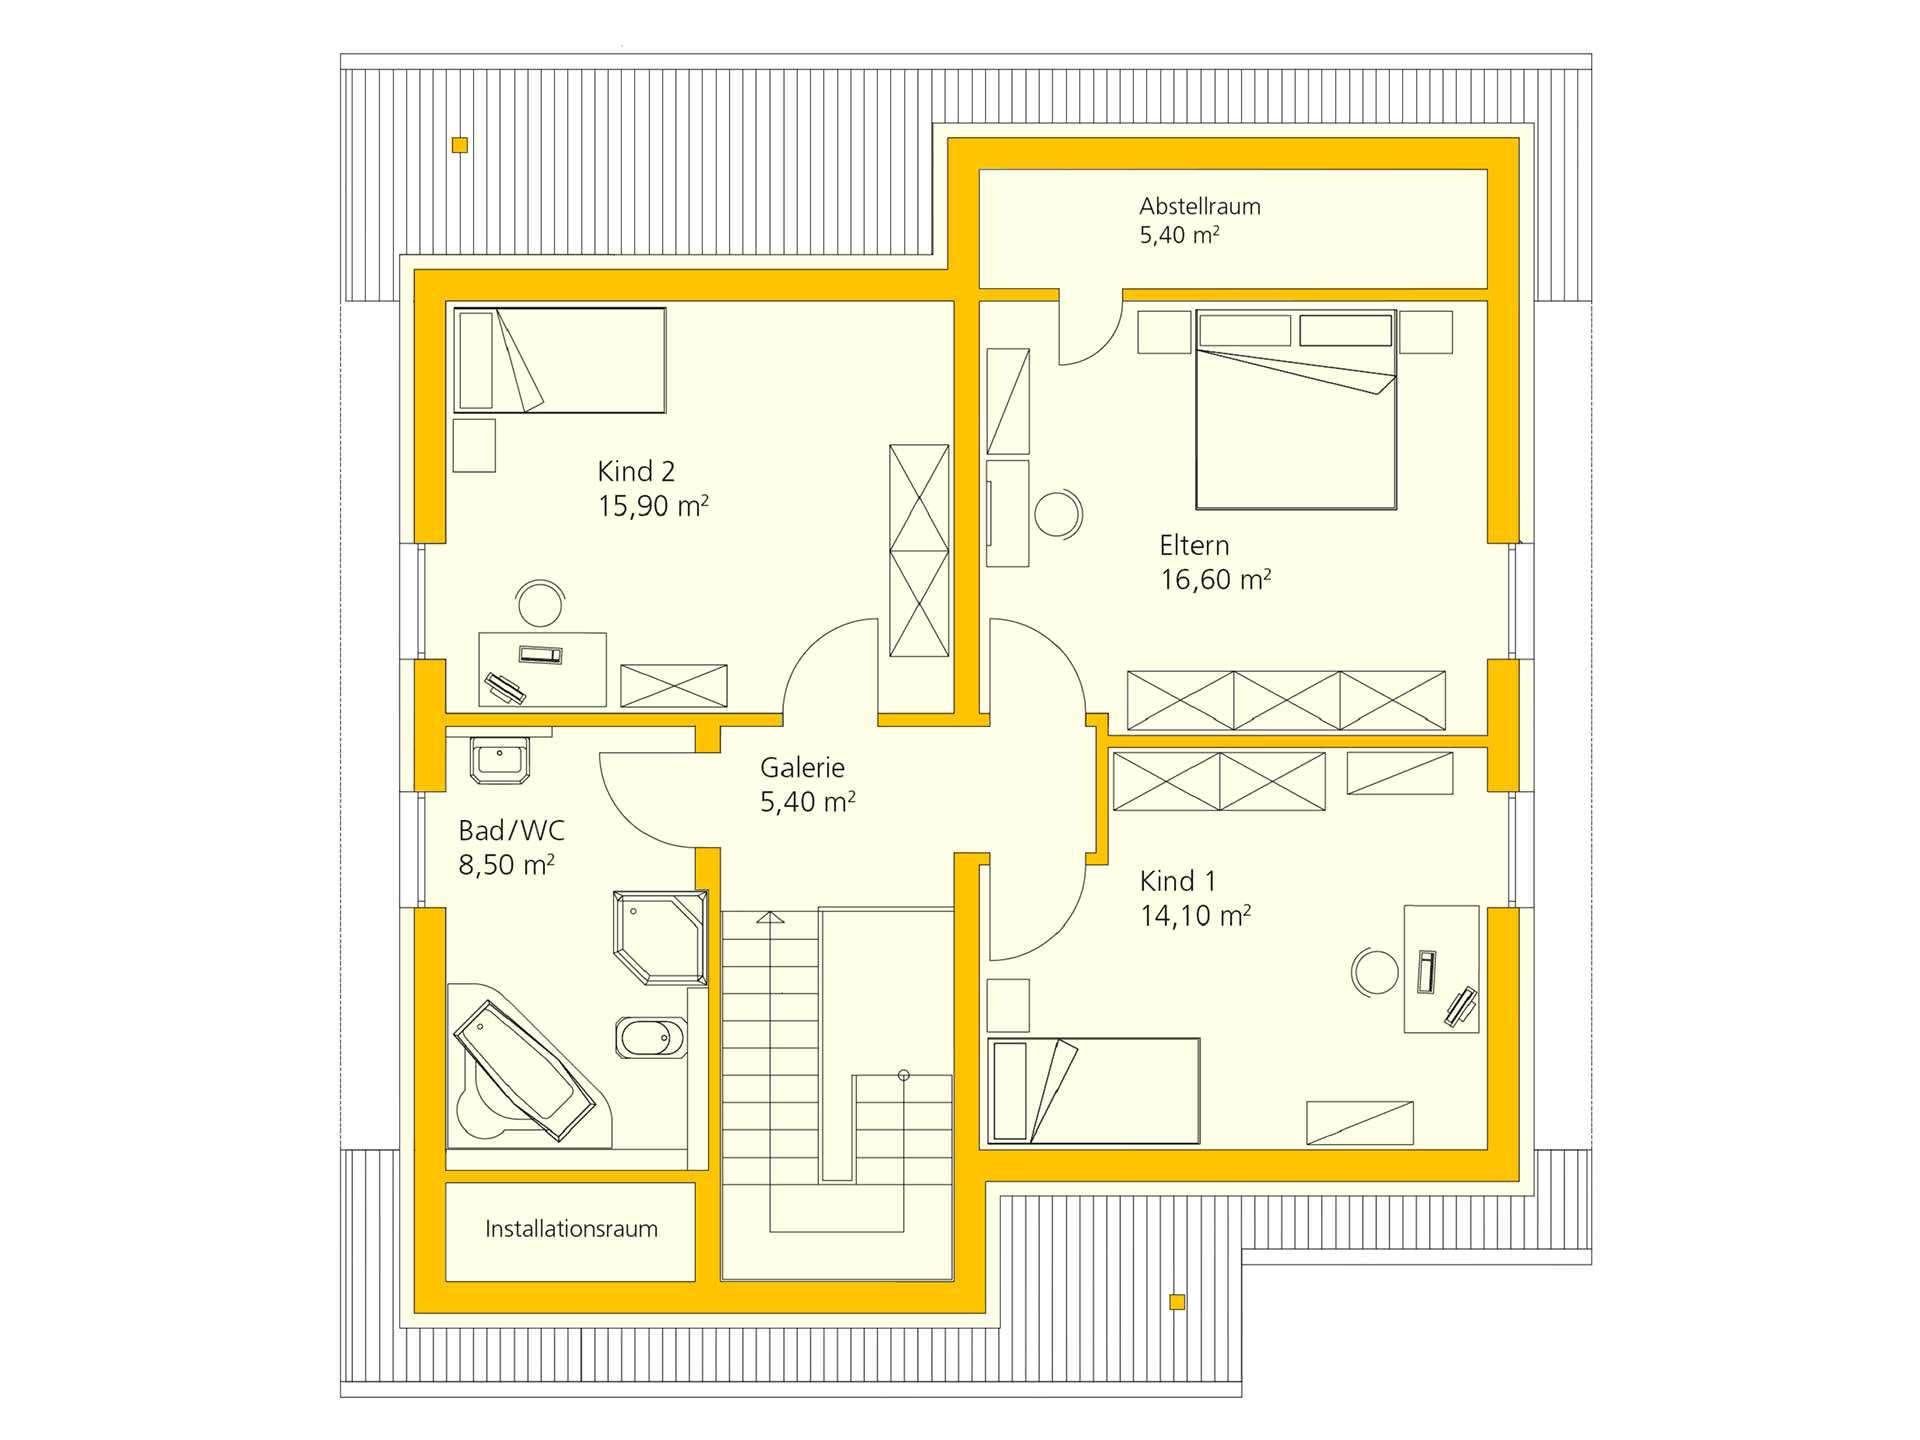 Ankleidezimmer planen - Musterhaus.net